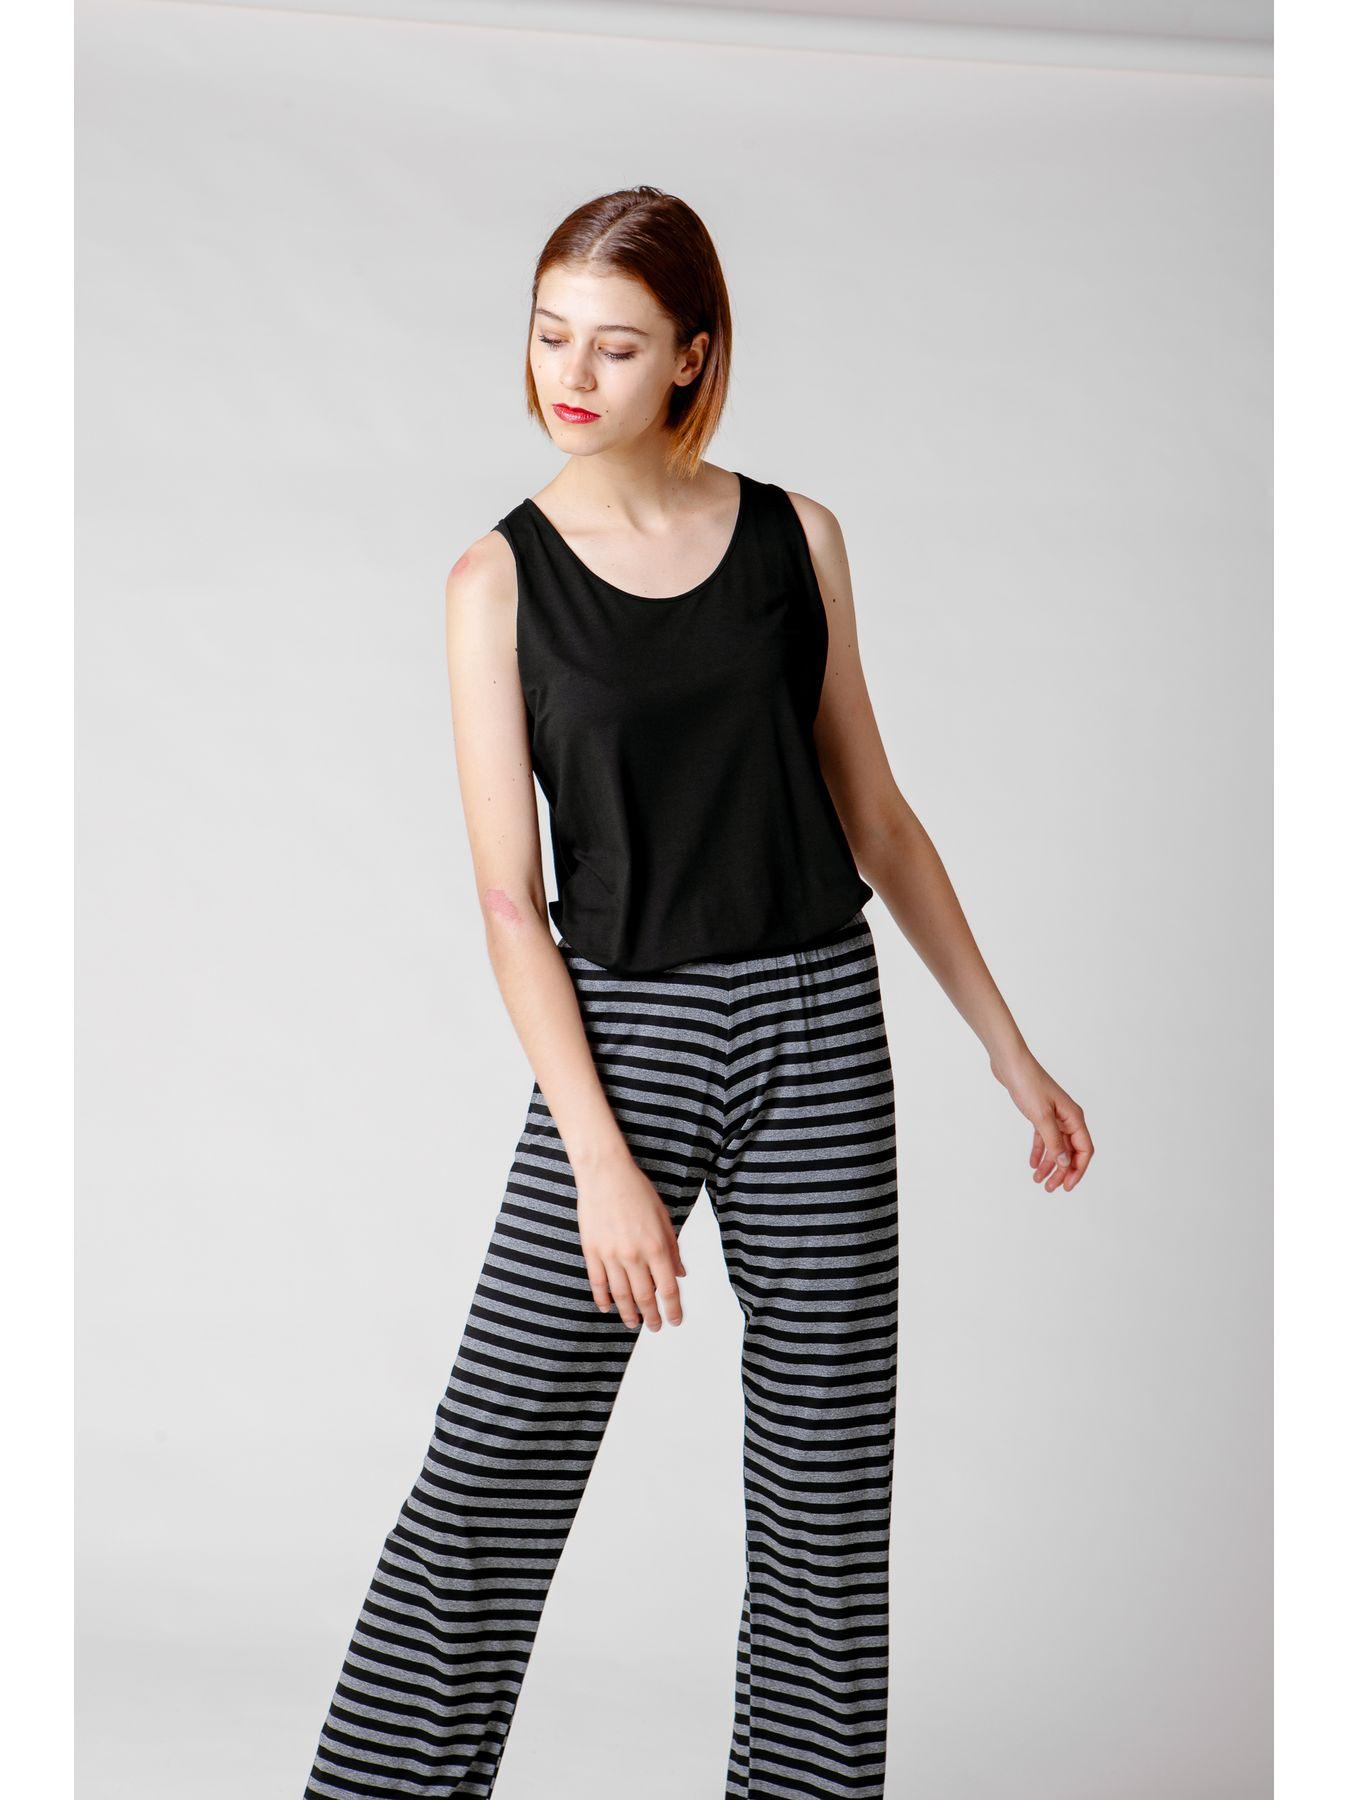 Pantalone elastico a righe